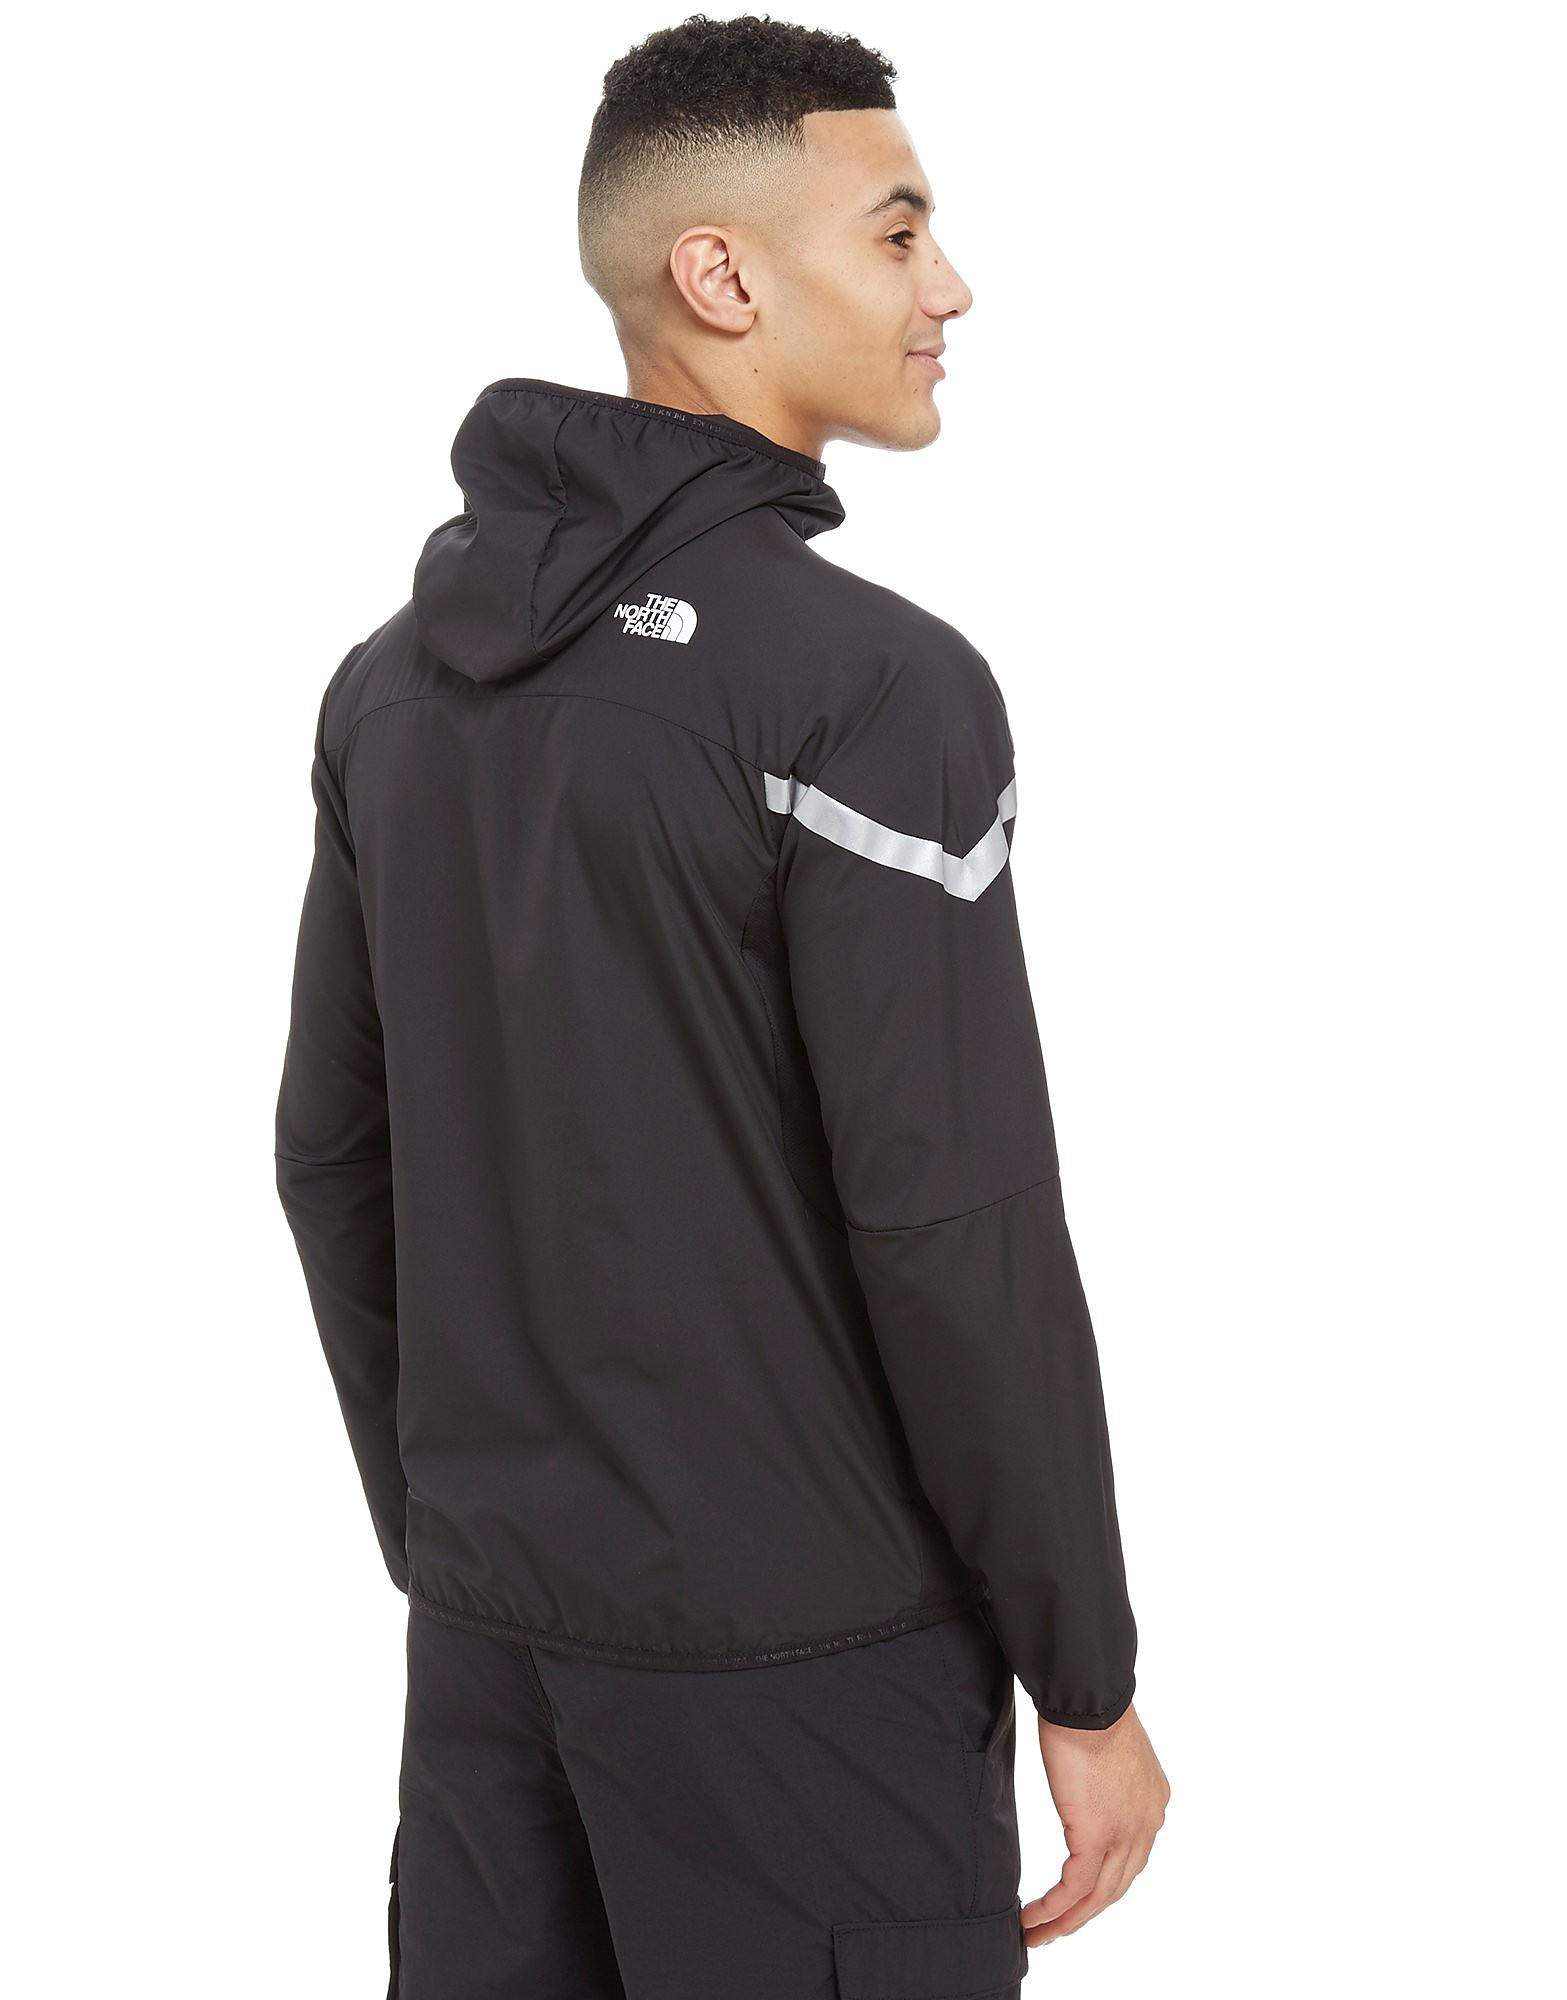 The North Face Terra Metro 1/2 Zip Jacket